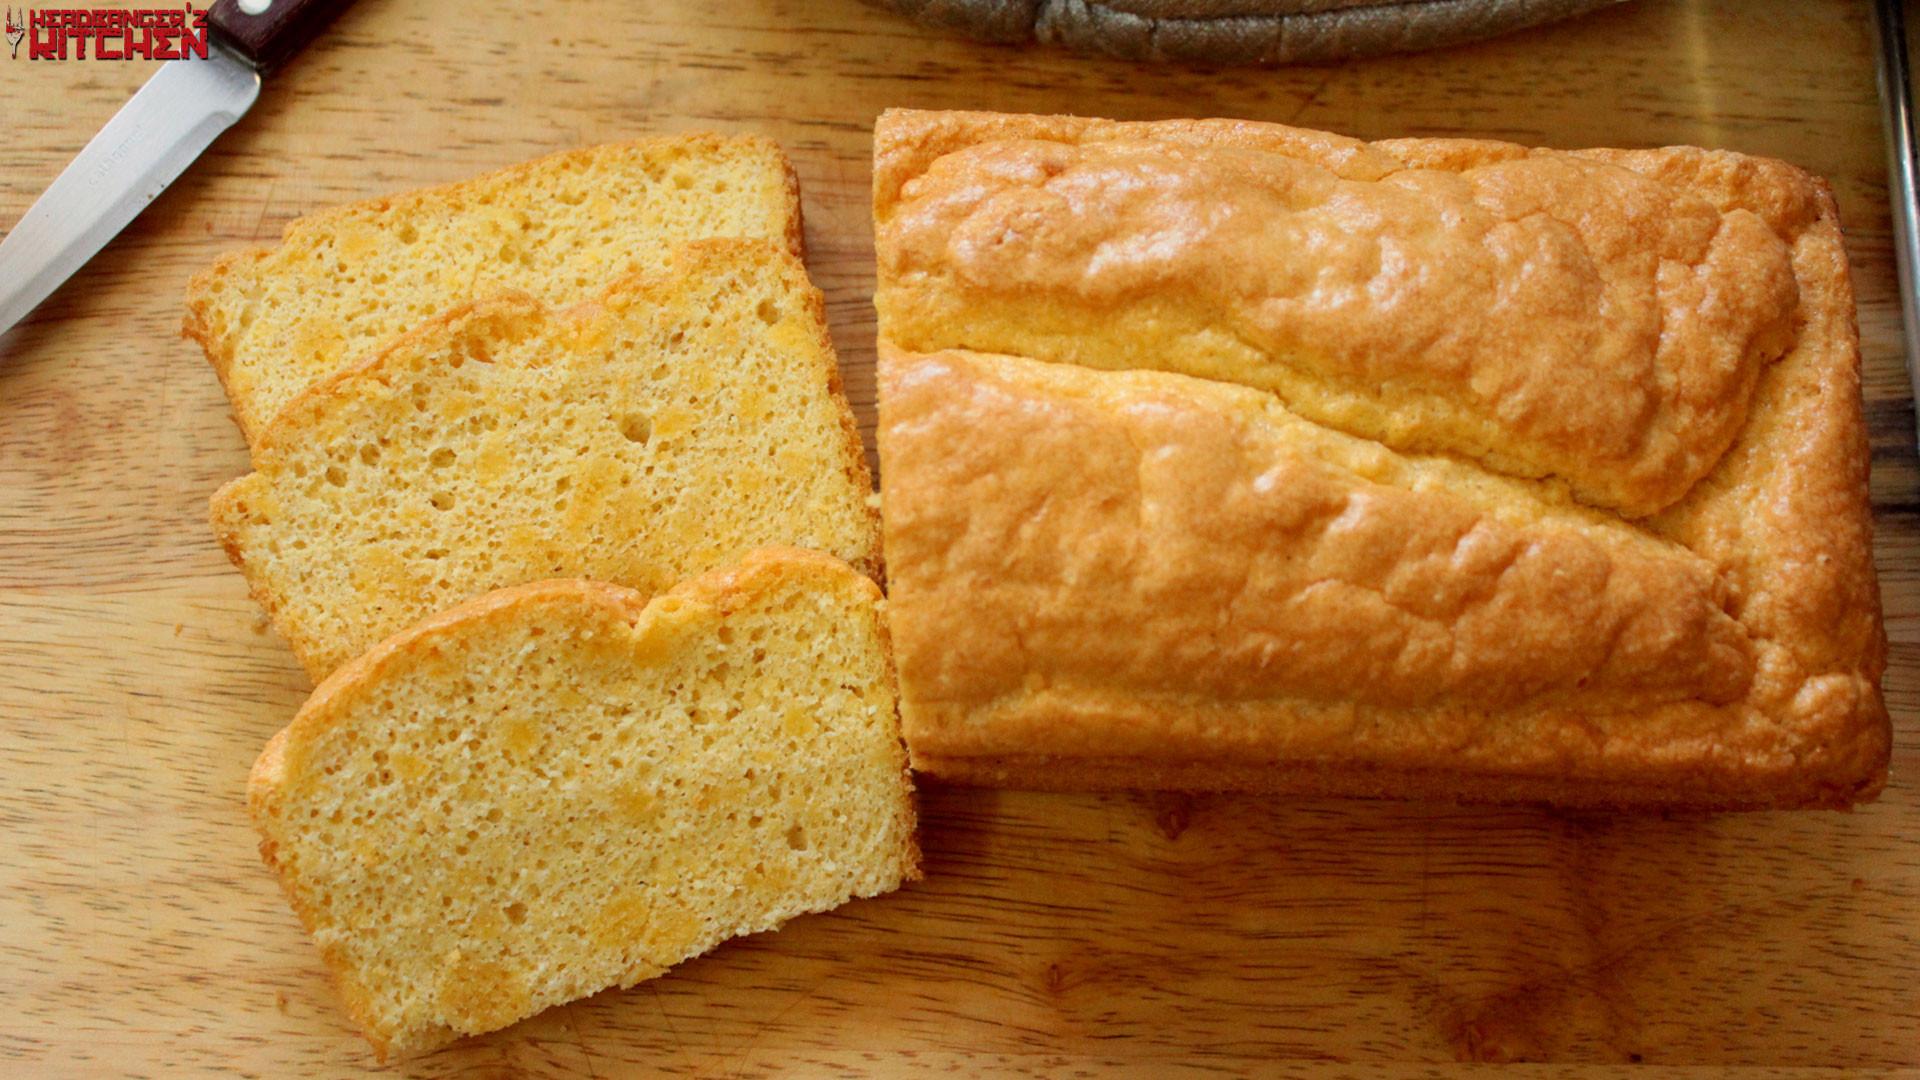 Recipes For Keto Bread  Making a Keto Bread Ketoconnect s Low Carb Bread Recipe